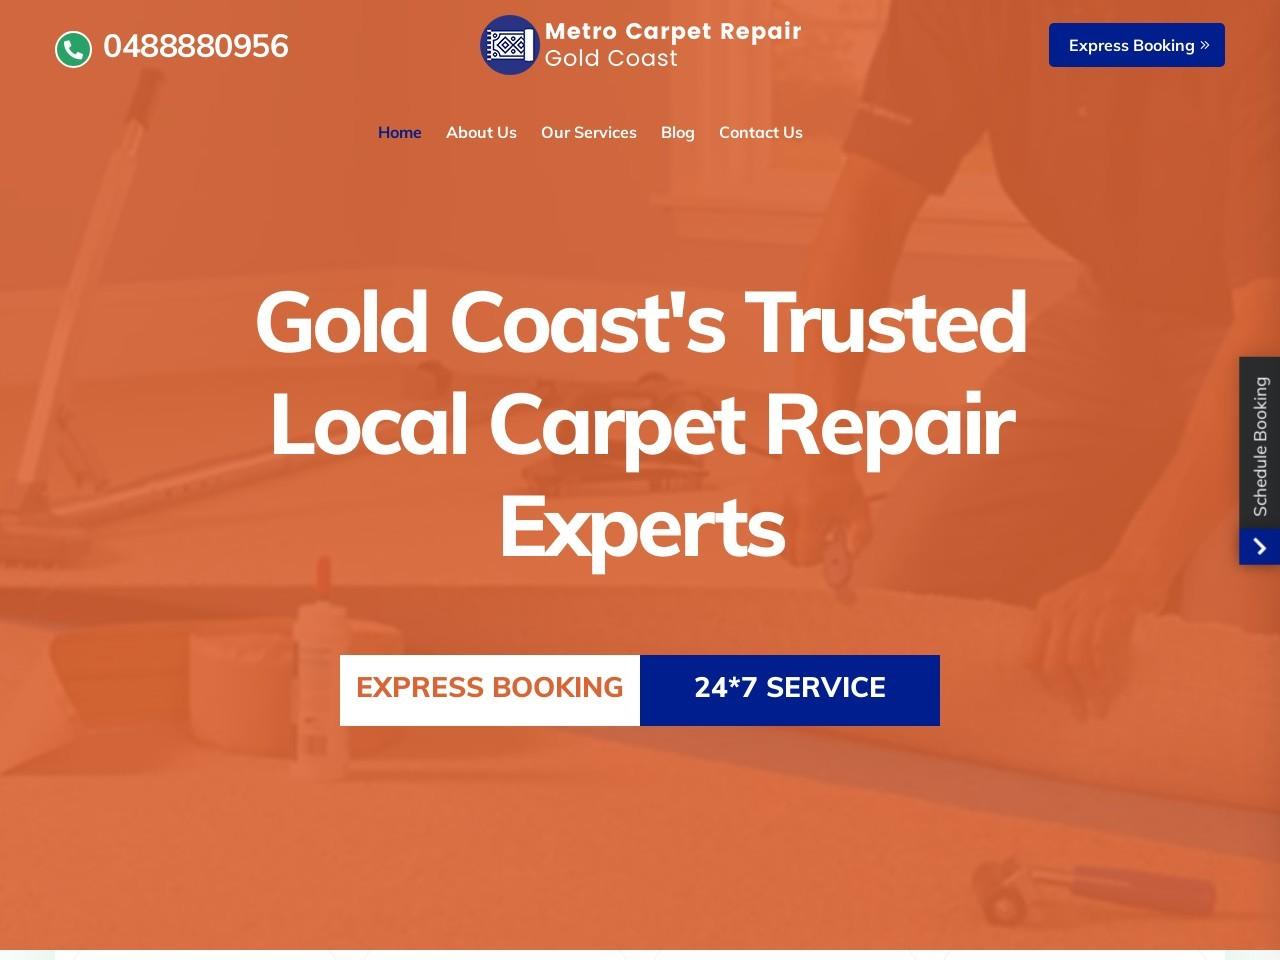 Book Carpet Repair & Carpet Restretching Services in Kingston .